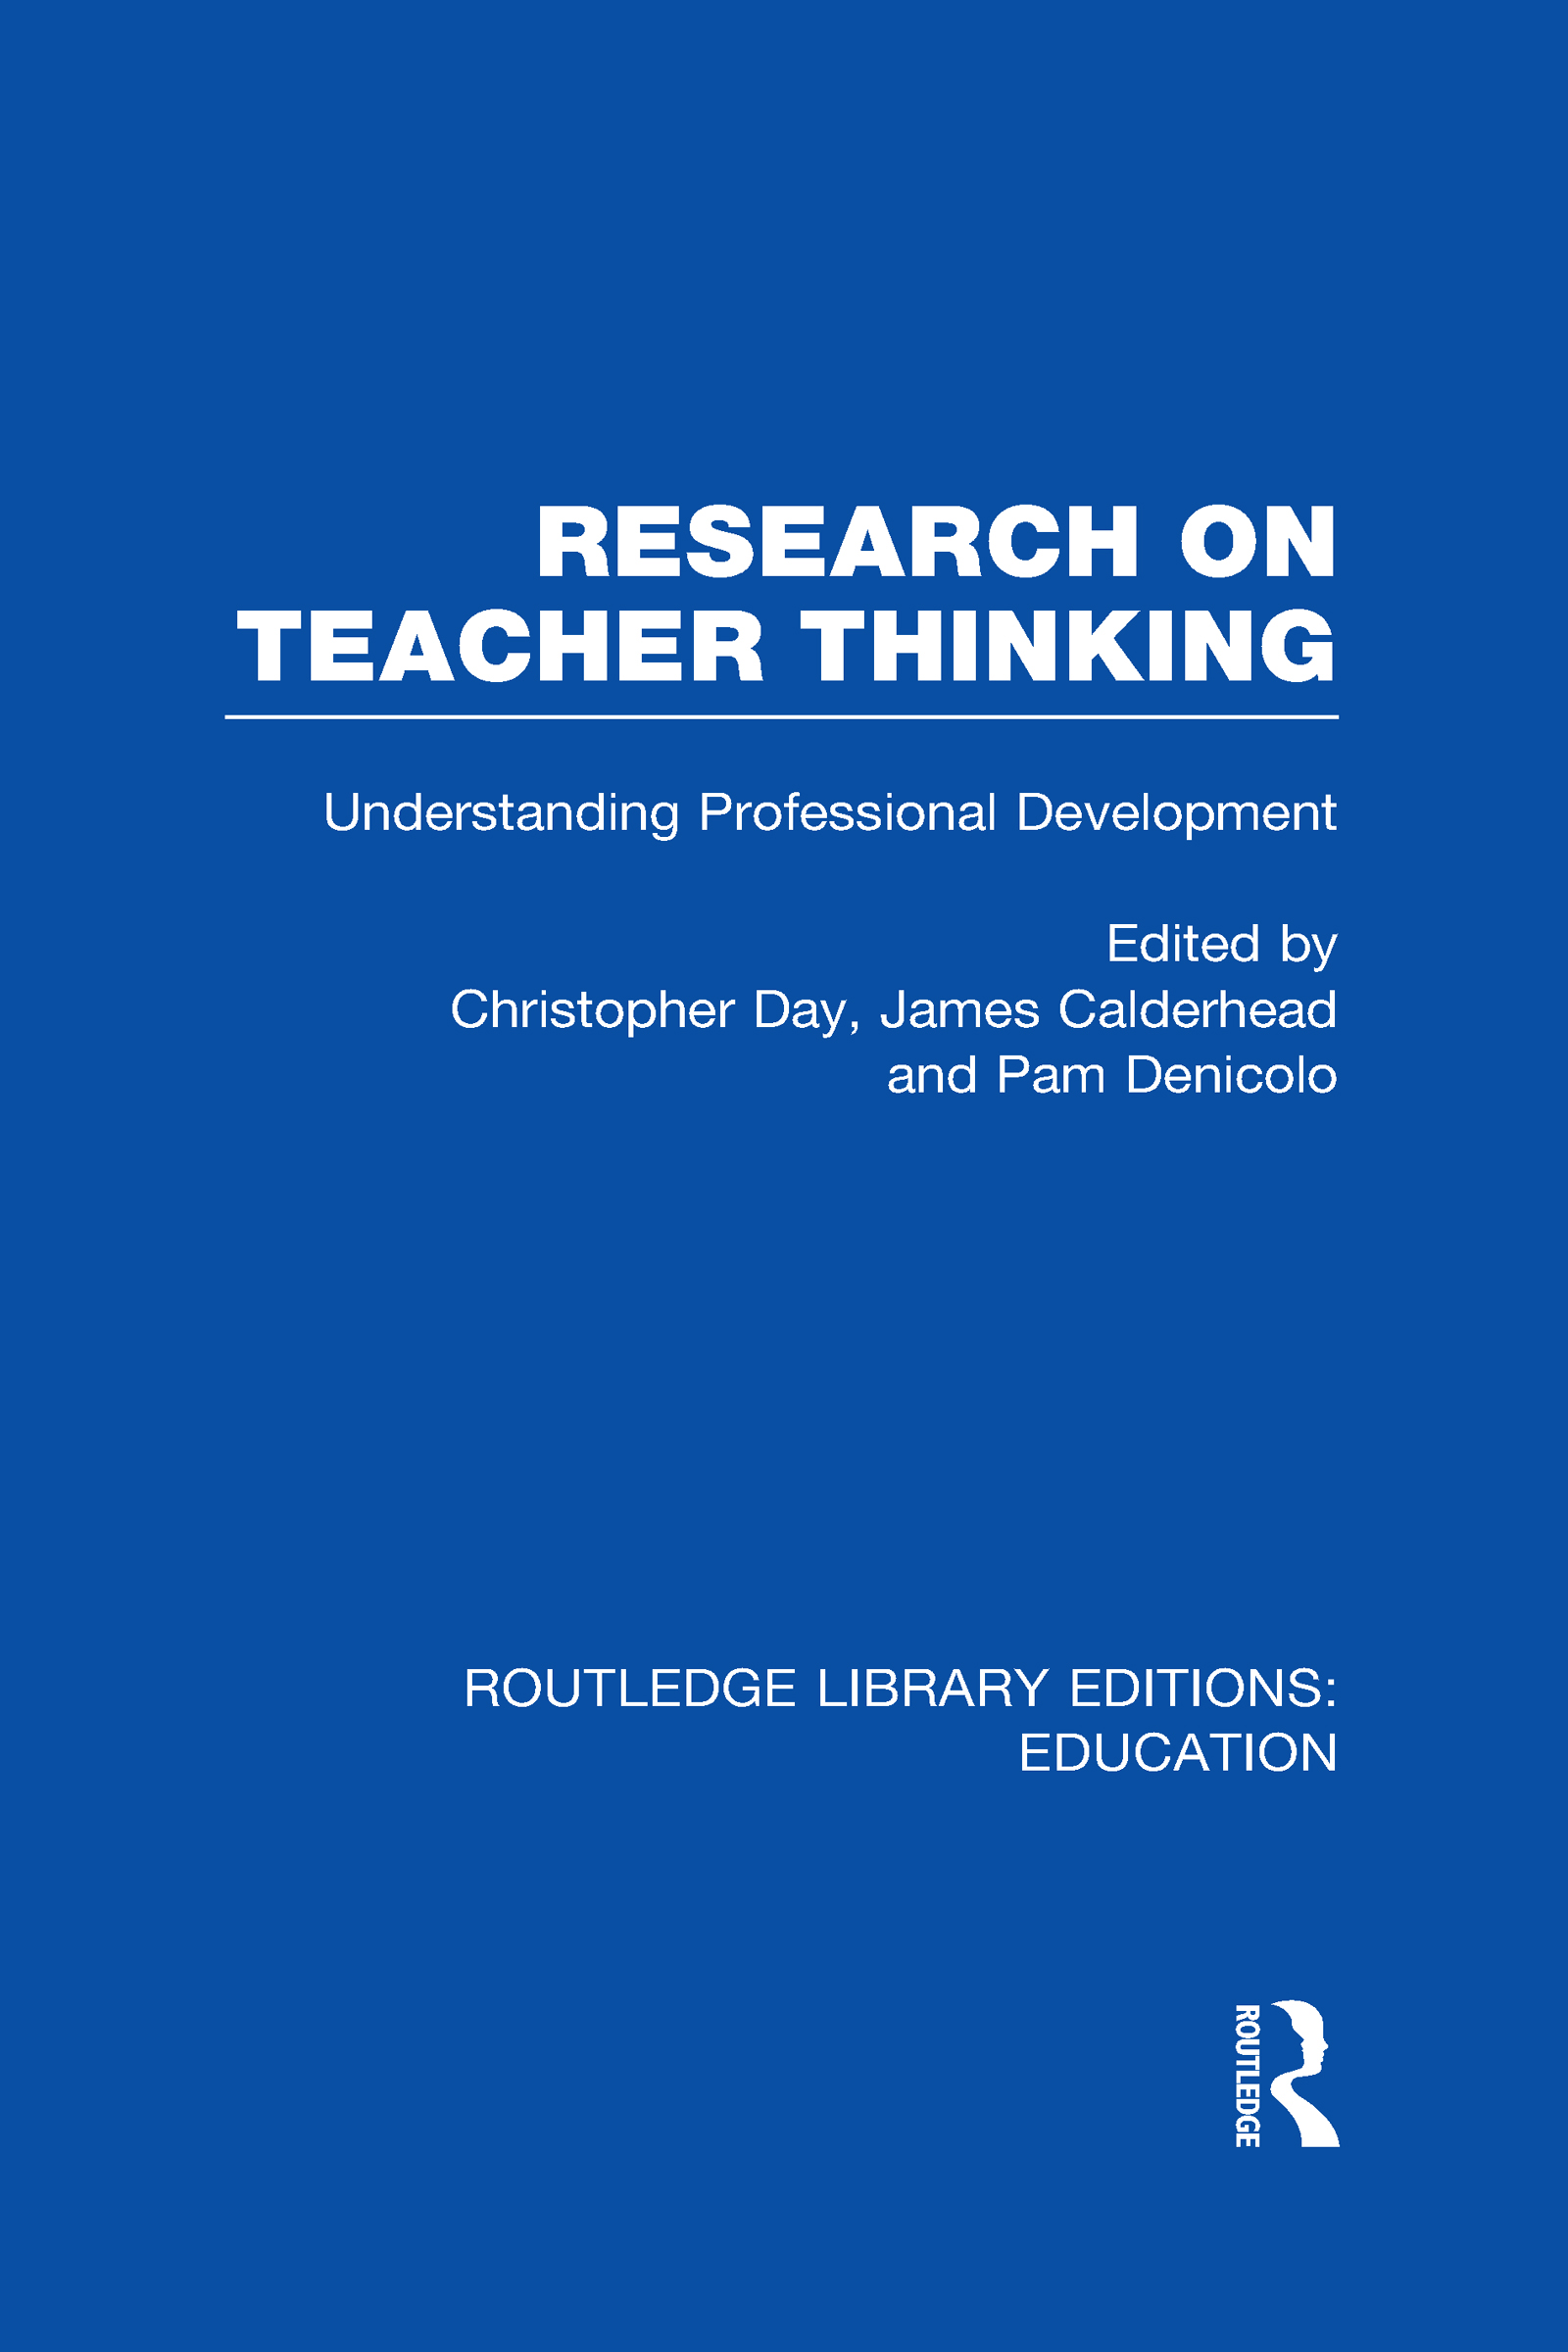 Research on Teacher Thinking (RLE Edu N): Understanding Professional Development (Hardback) book cover